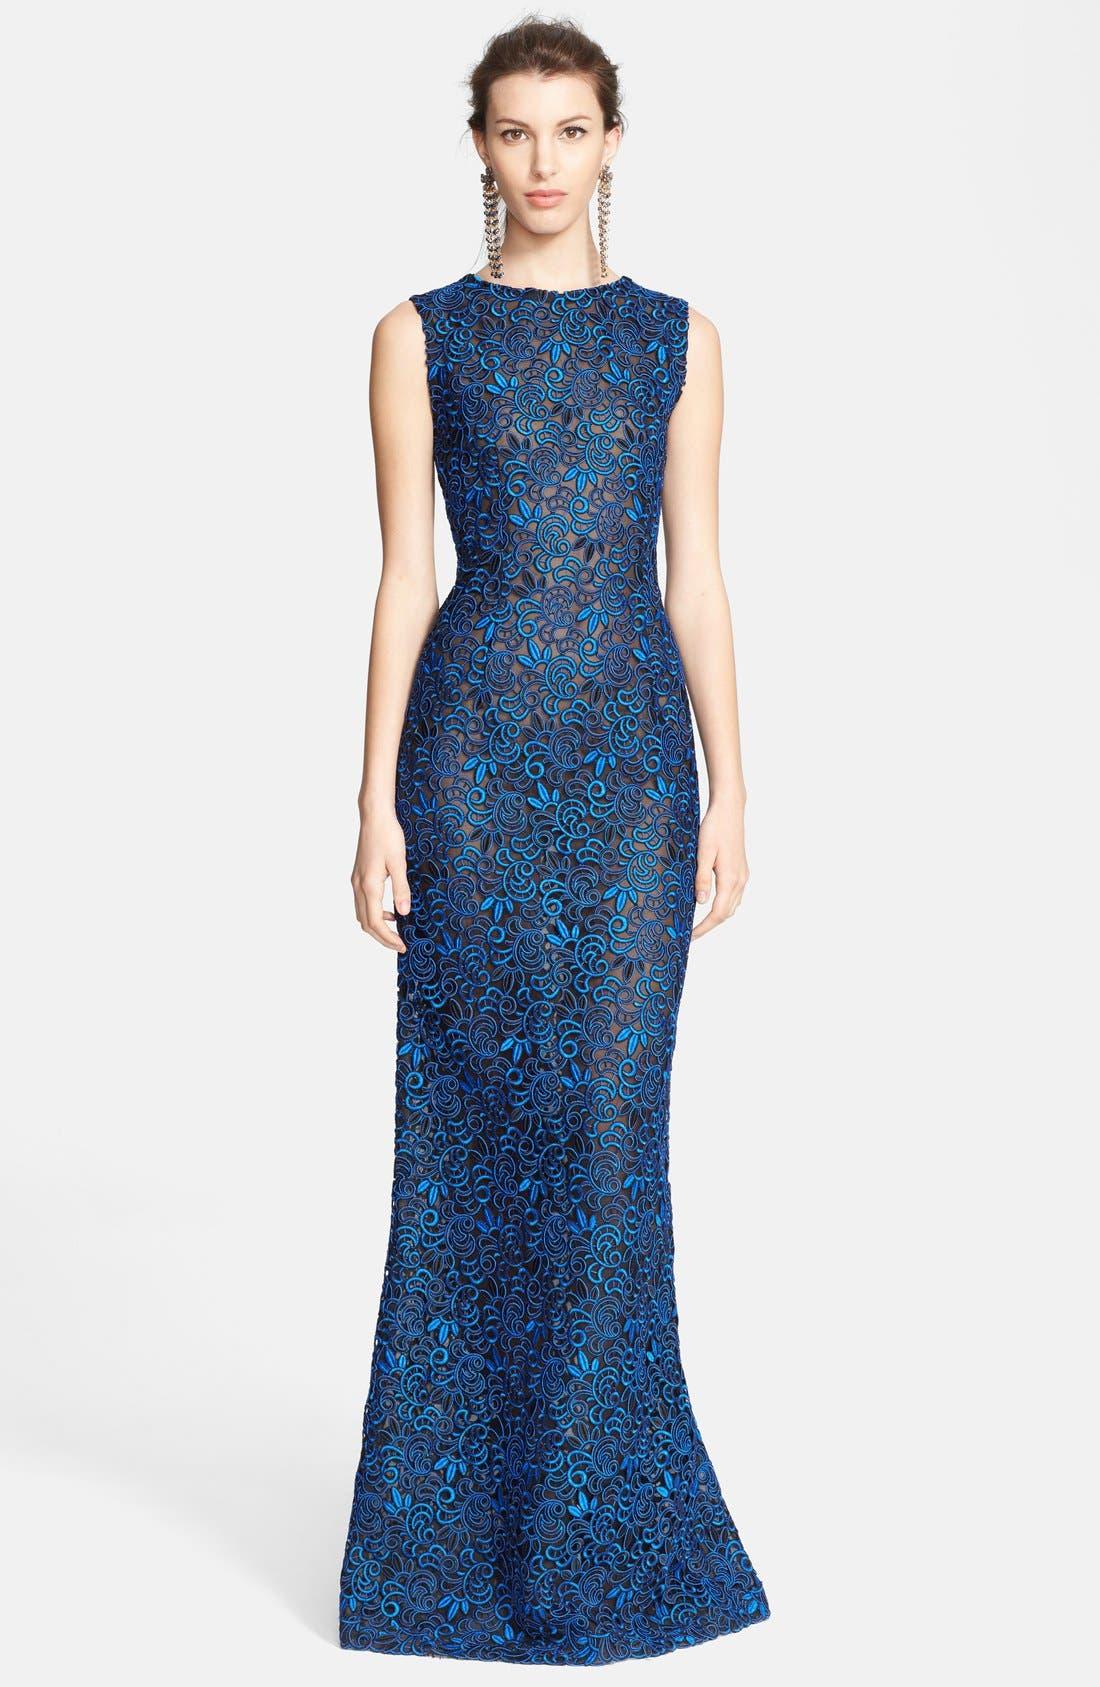 Alternate Image 1 Selected - Oscar de la Renta Embroidered Silk Column Gown